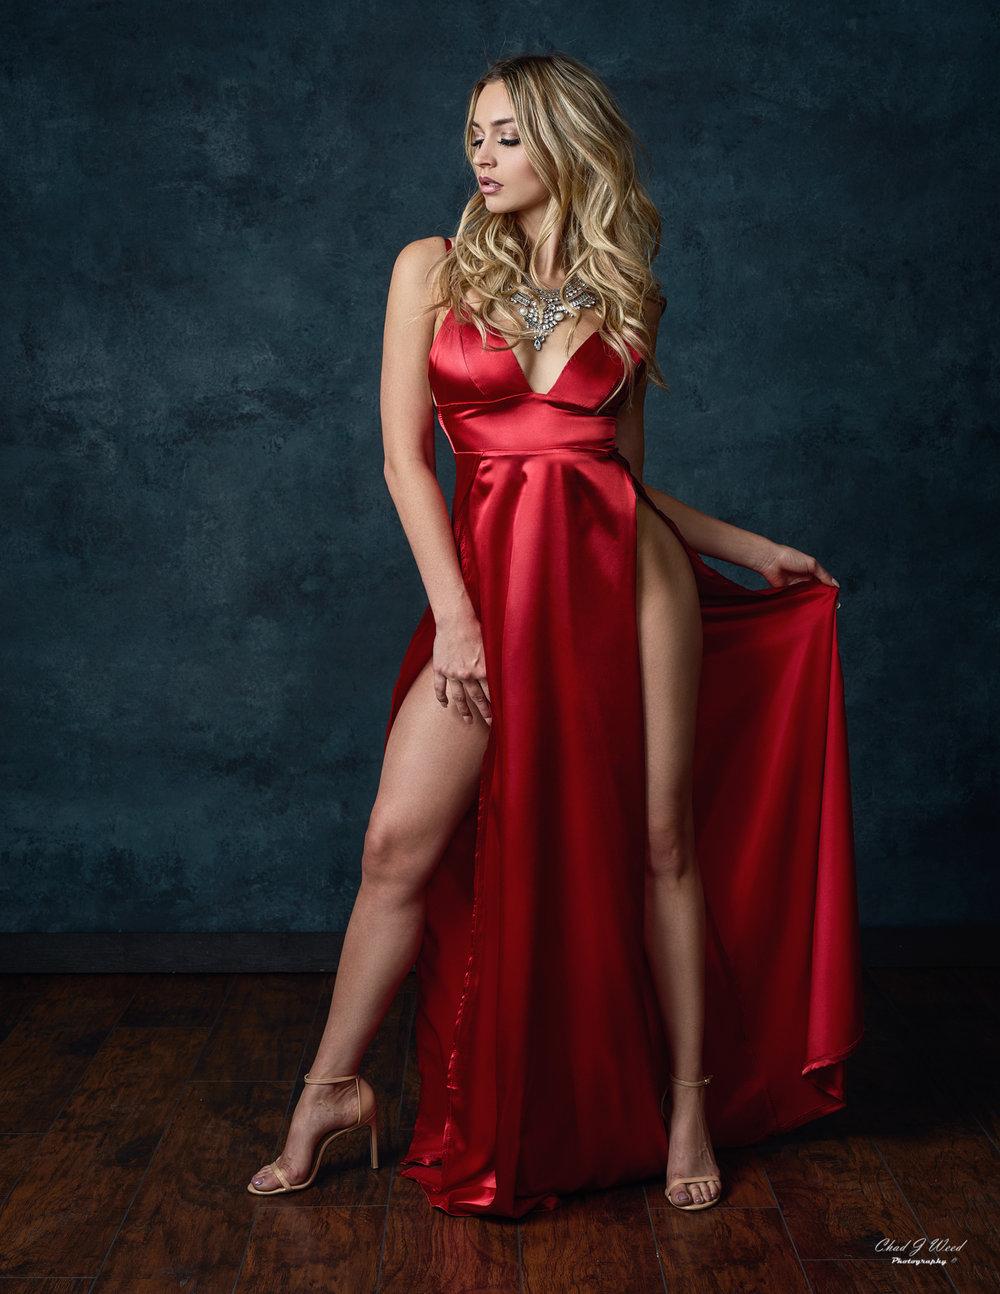 Fashion Model Shea by Arizona Fashion Photographer Chad Weed